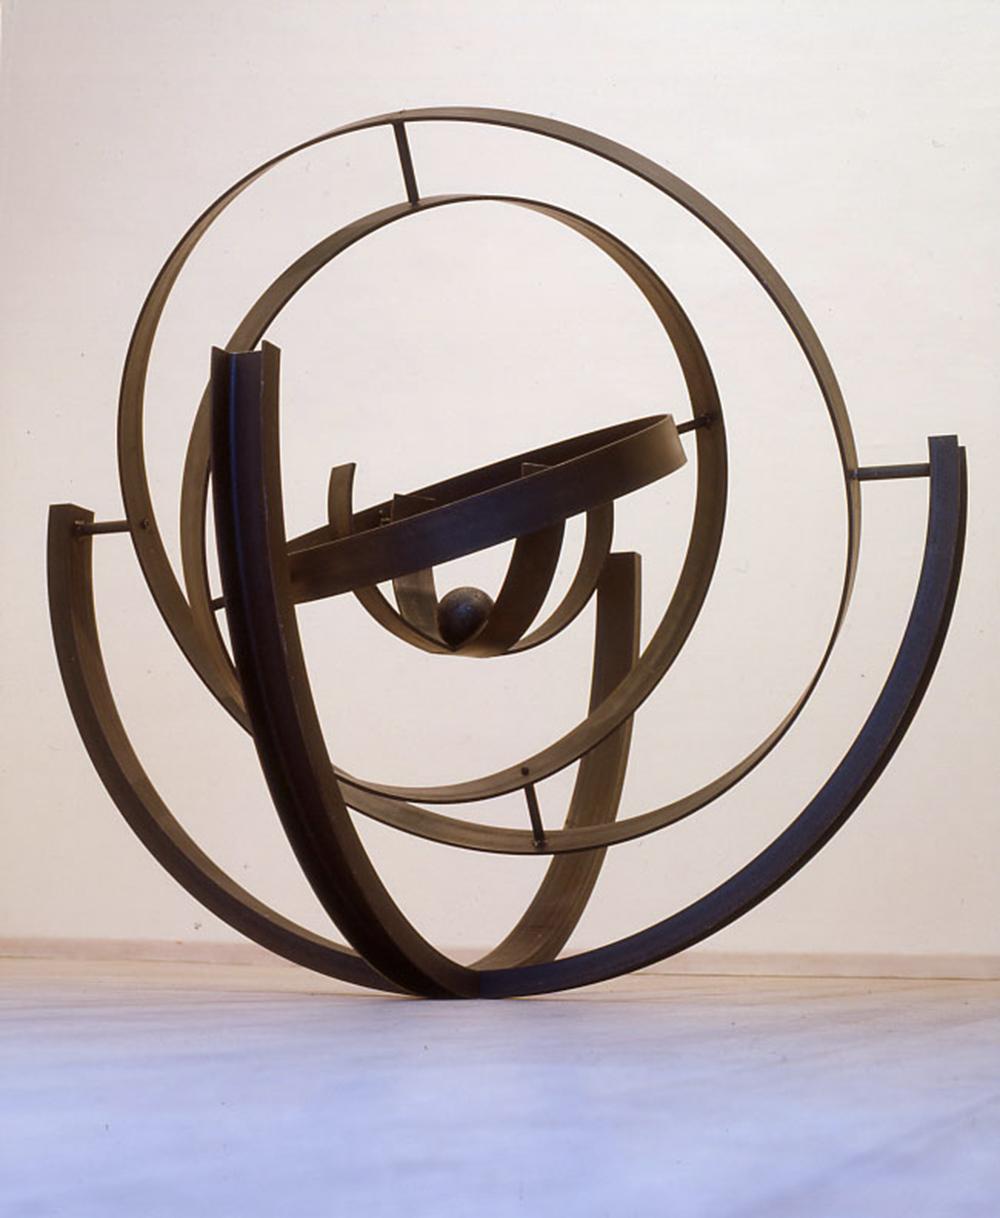 Eliseo Mattiacci, Capta segnali, 2003, ferro, cm 160x160x160